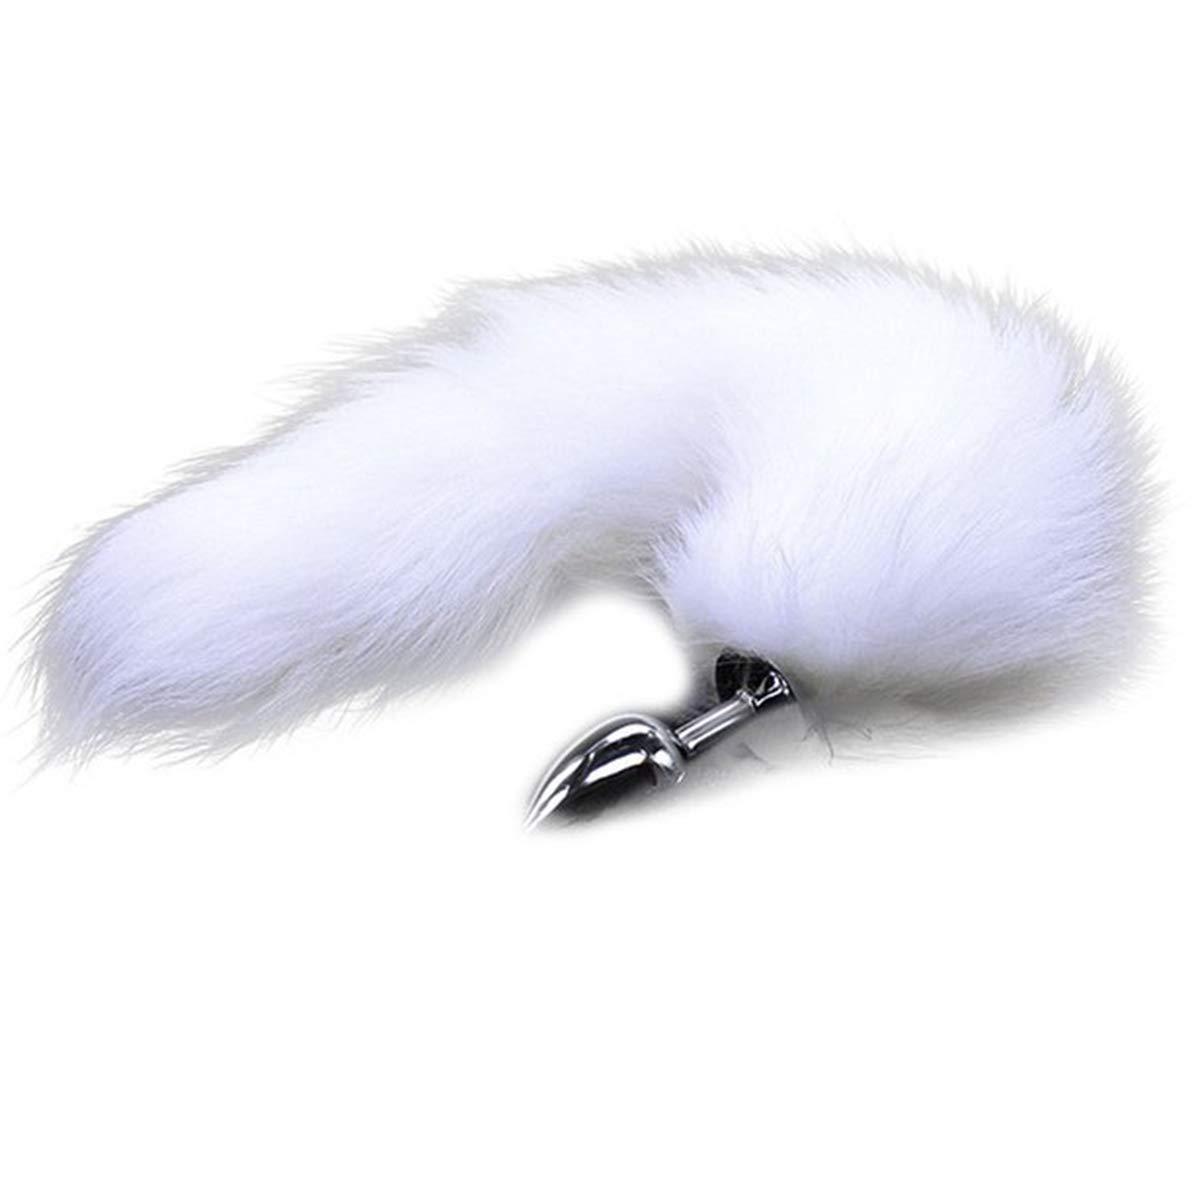 Foxs Tails Anal Butt Plug